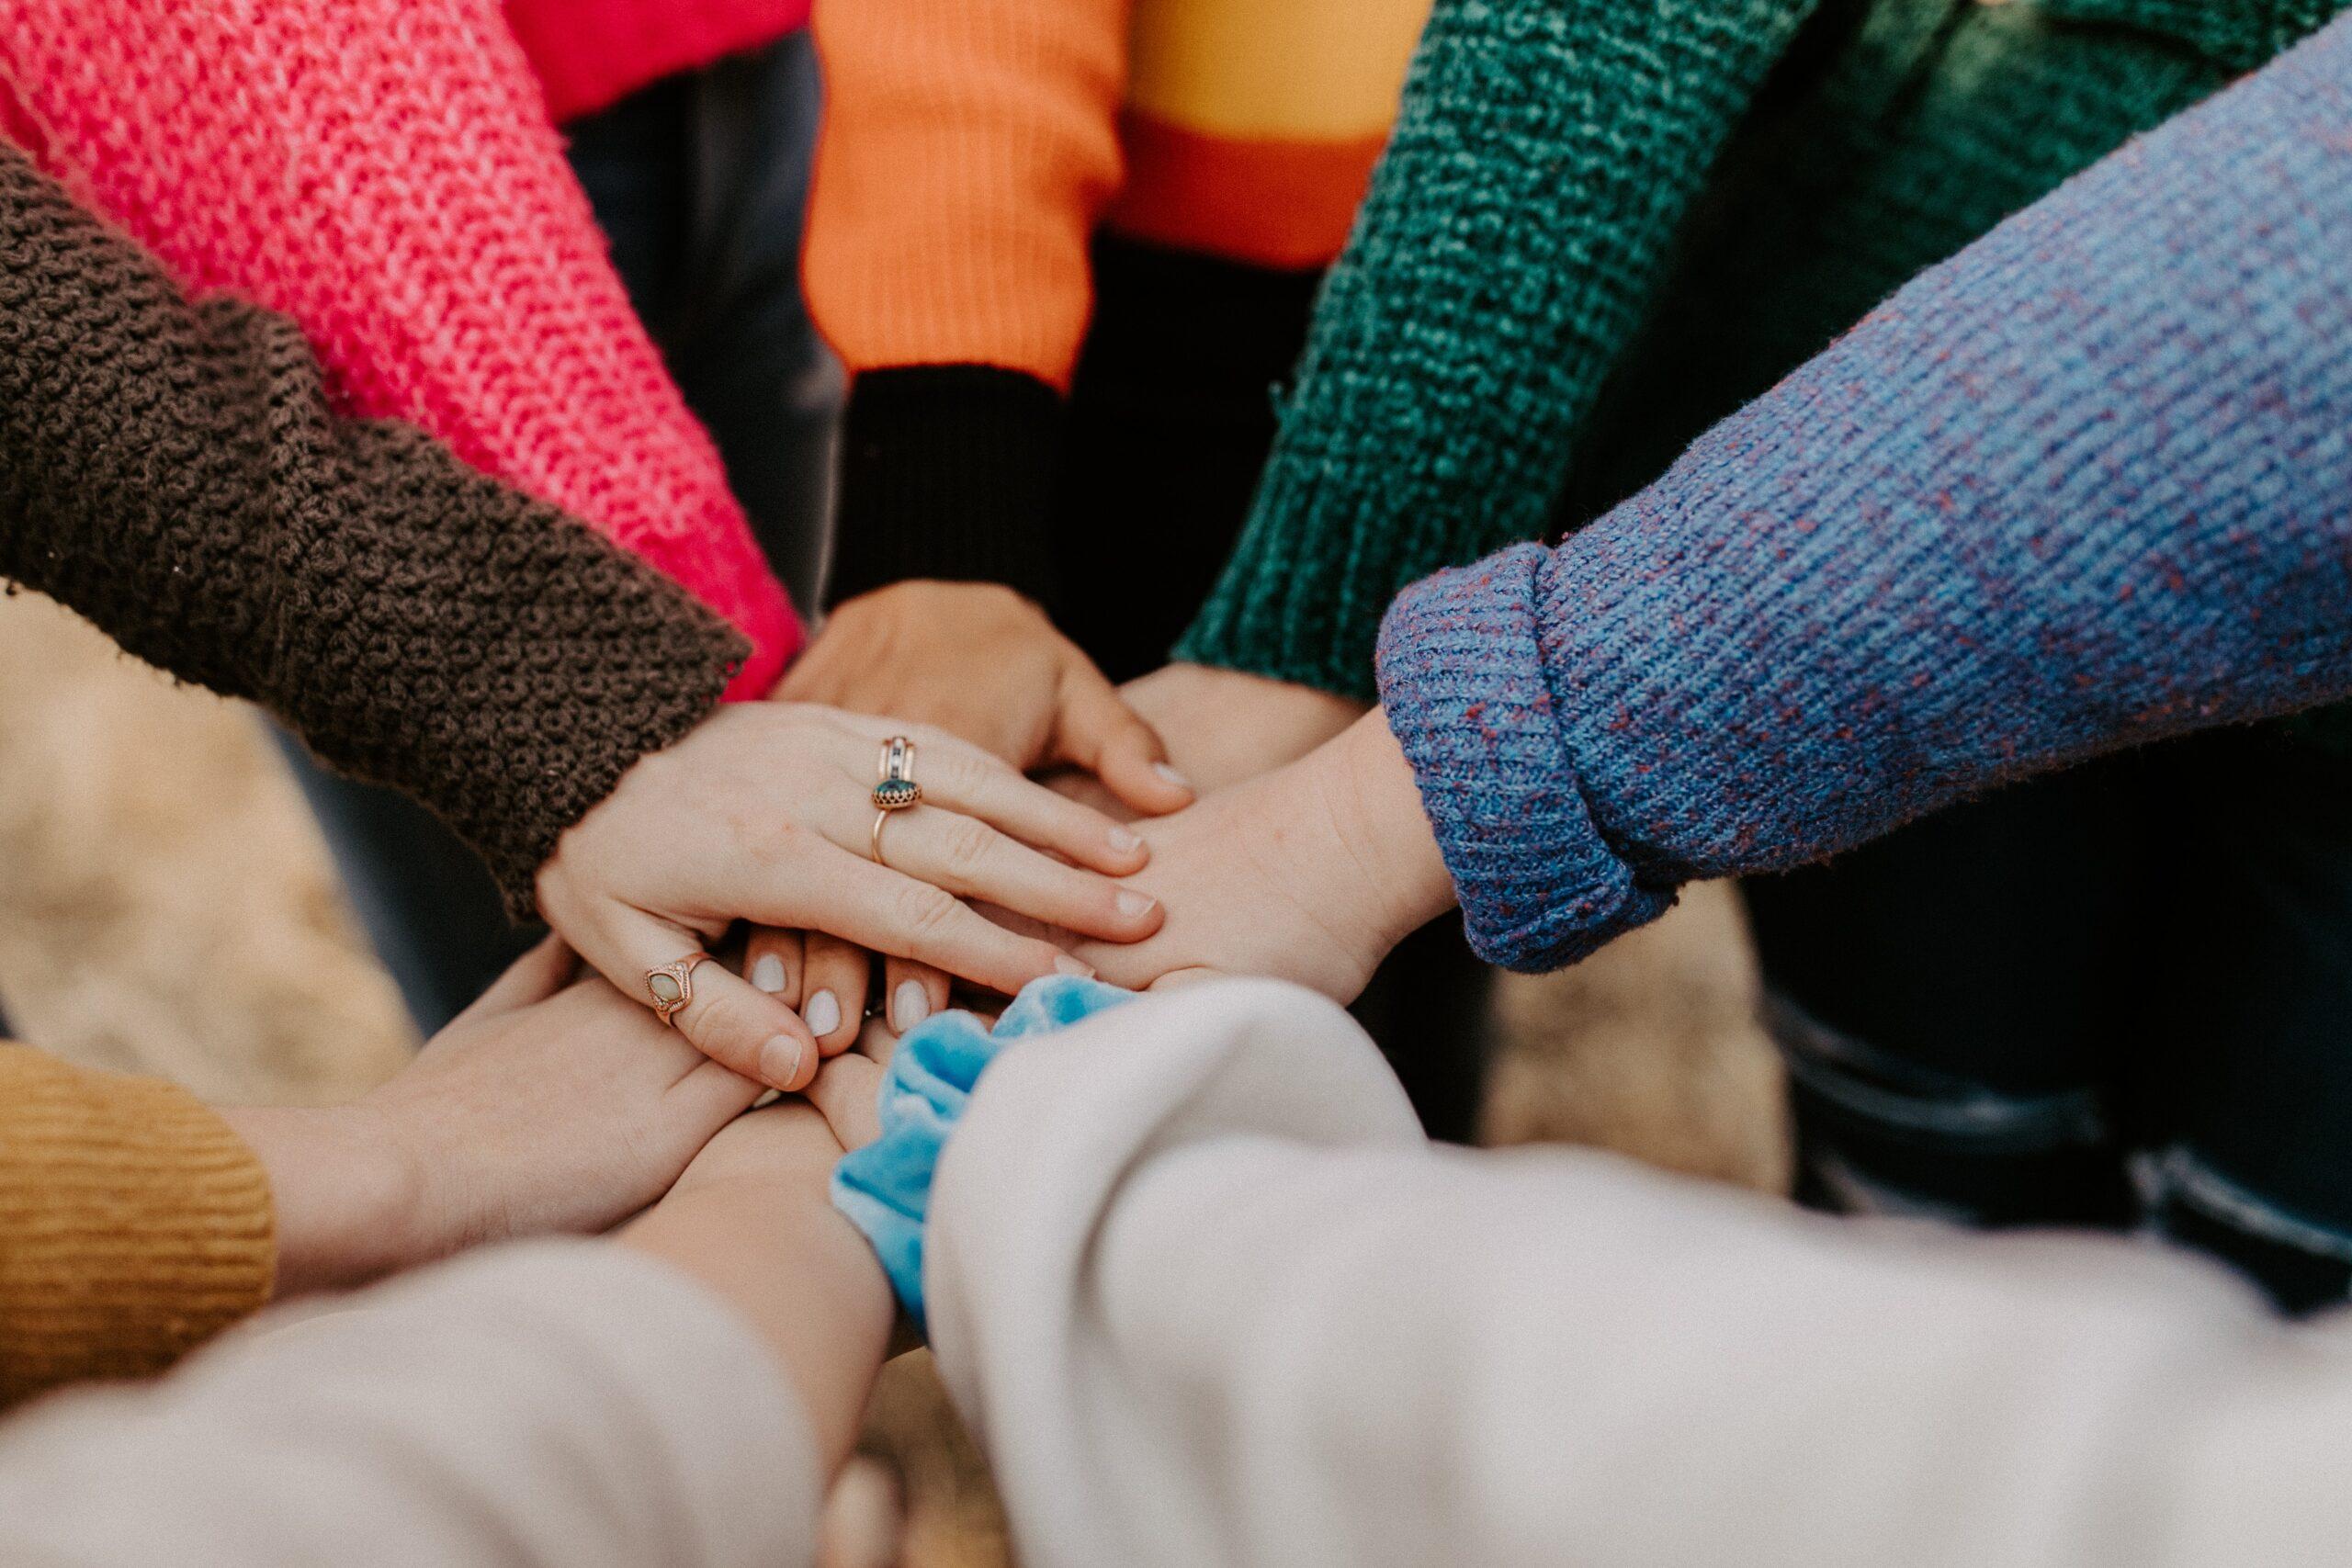 A group displaying teamwork